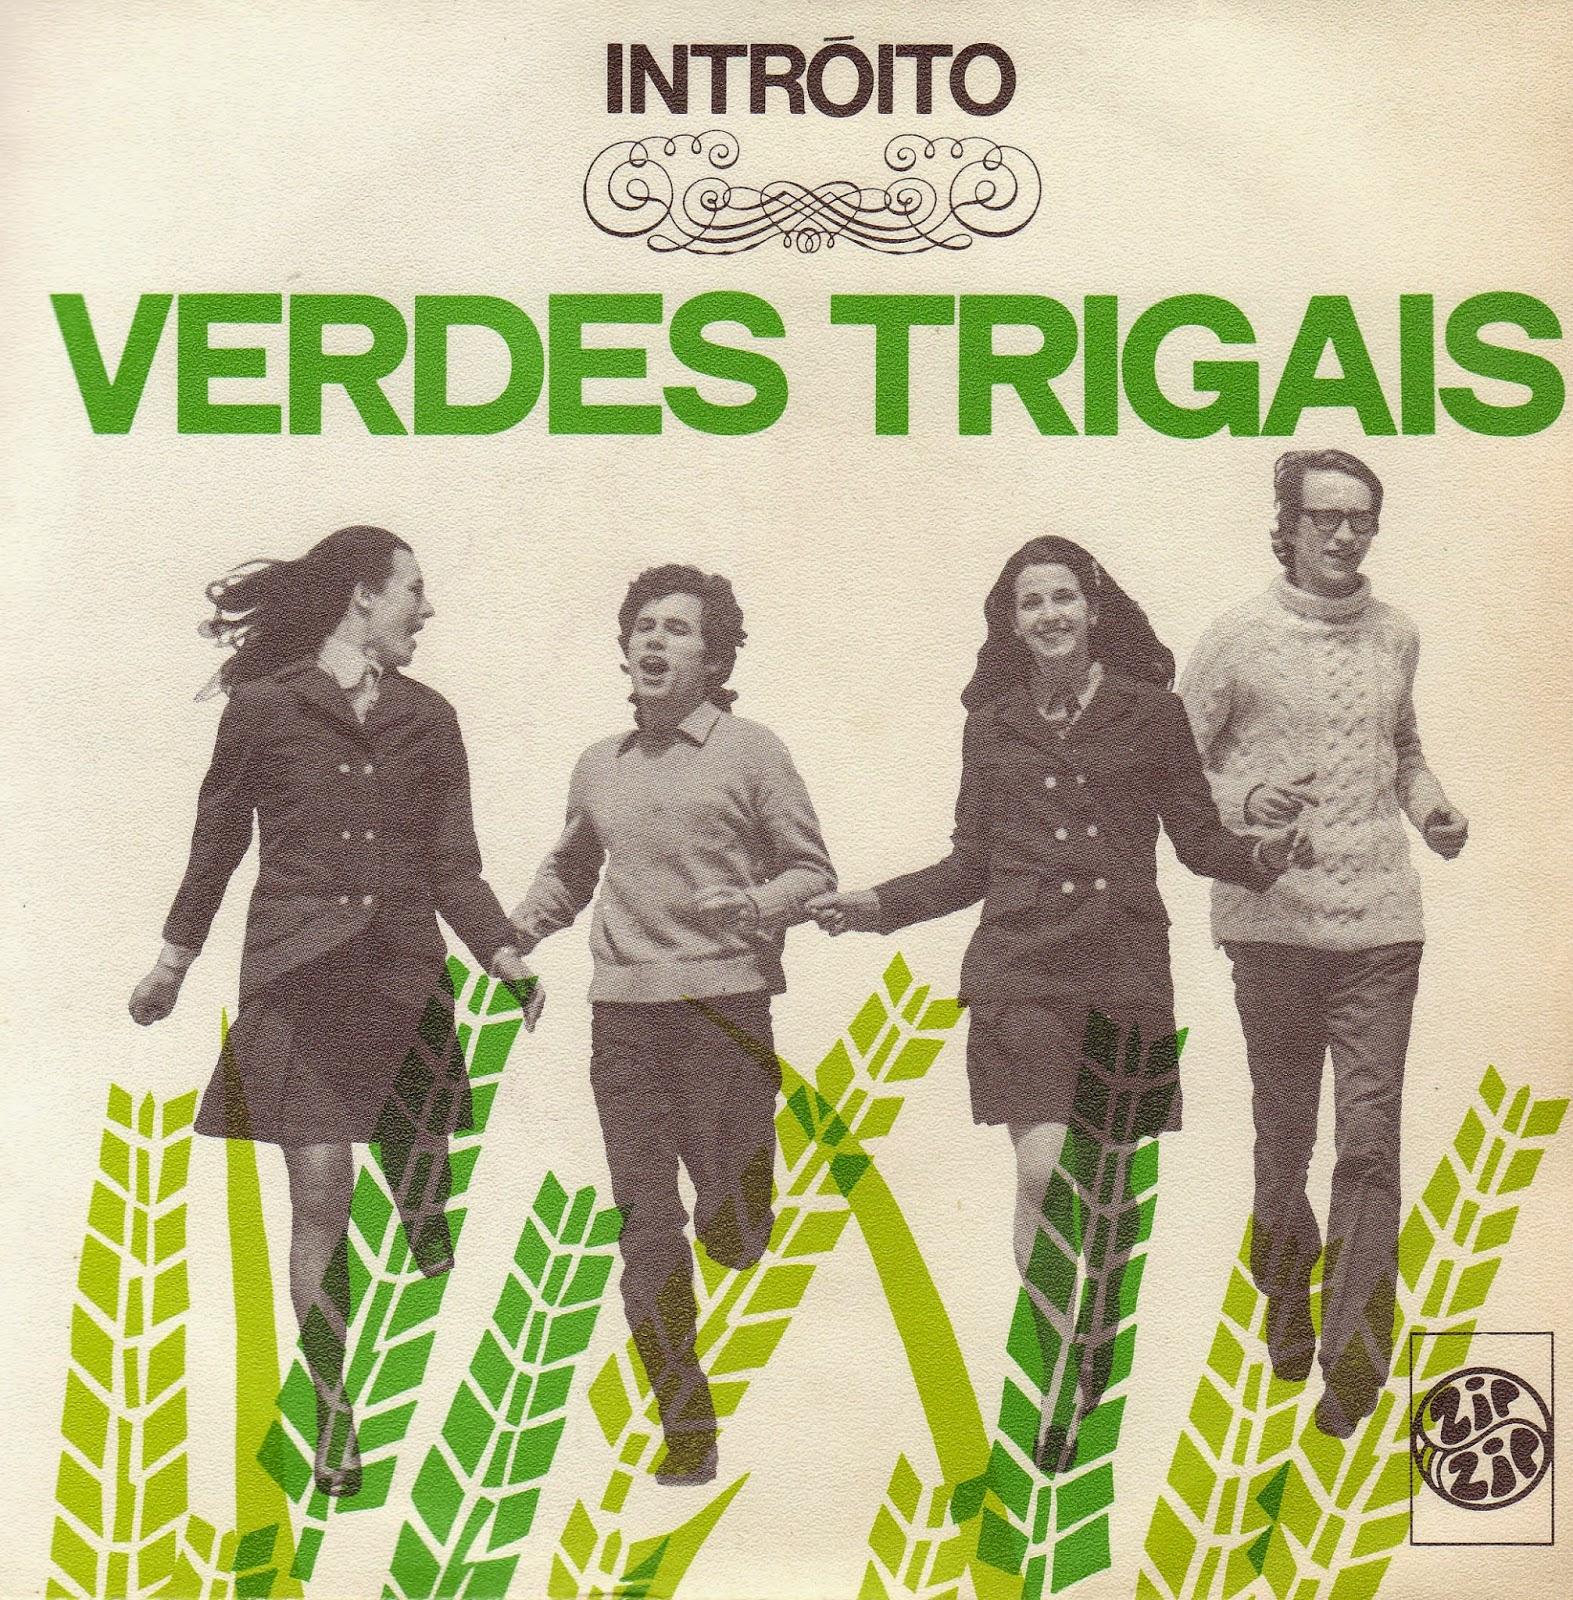 http://abelhas.pt/MusicBox/Musica+Portuguesa/Intr*c3*b3ito/Intr*c3*b3ito+(Single+1970)+-+Verdes+Trigais,75825057.rar(archive)